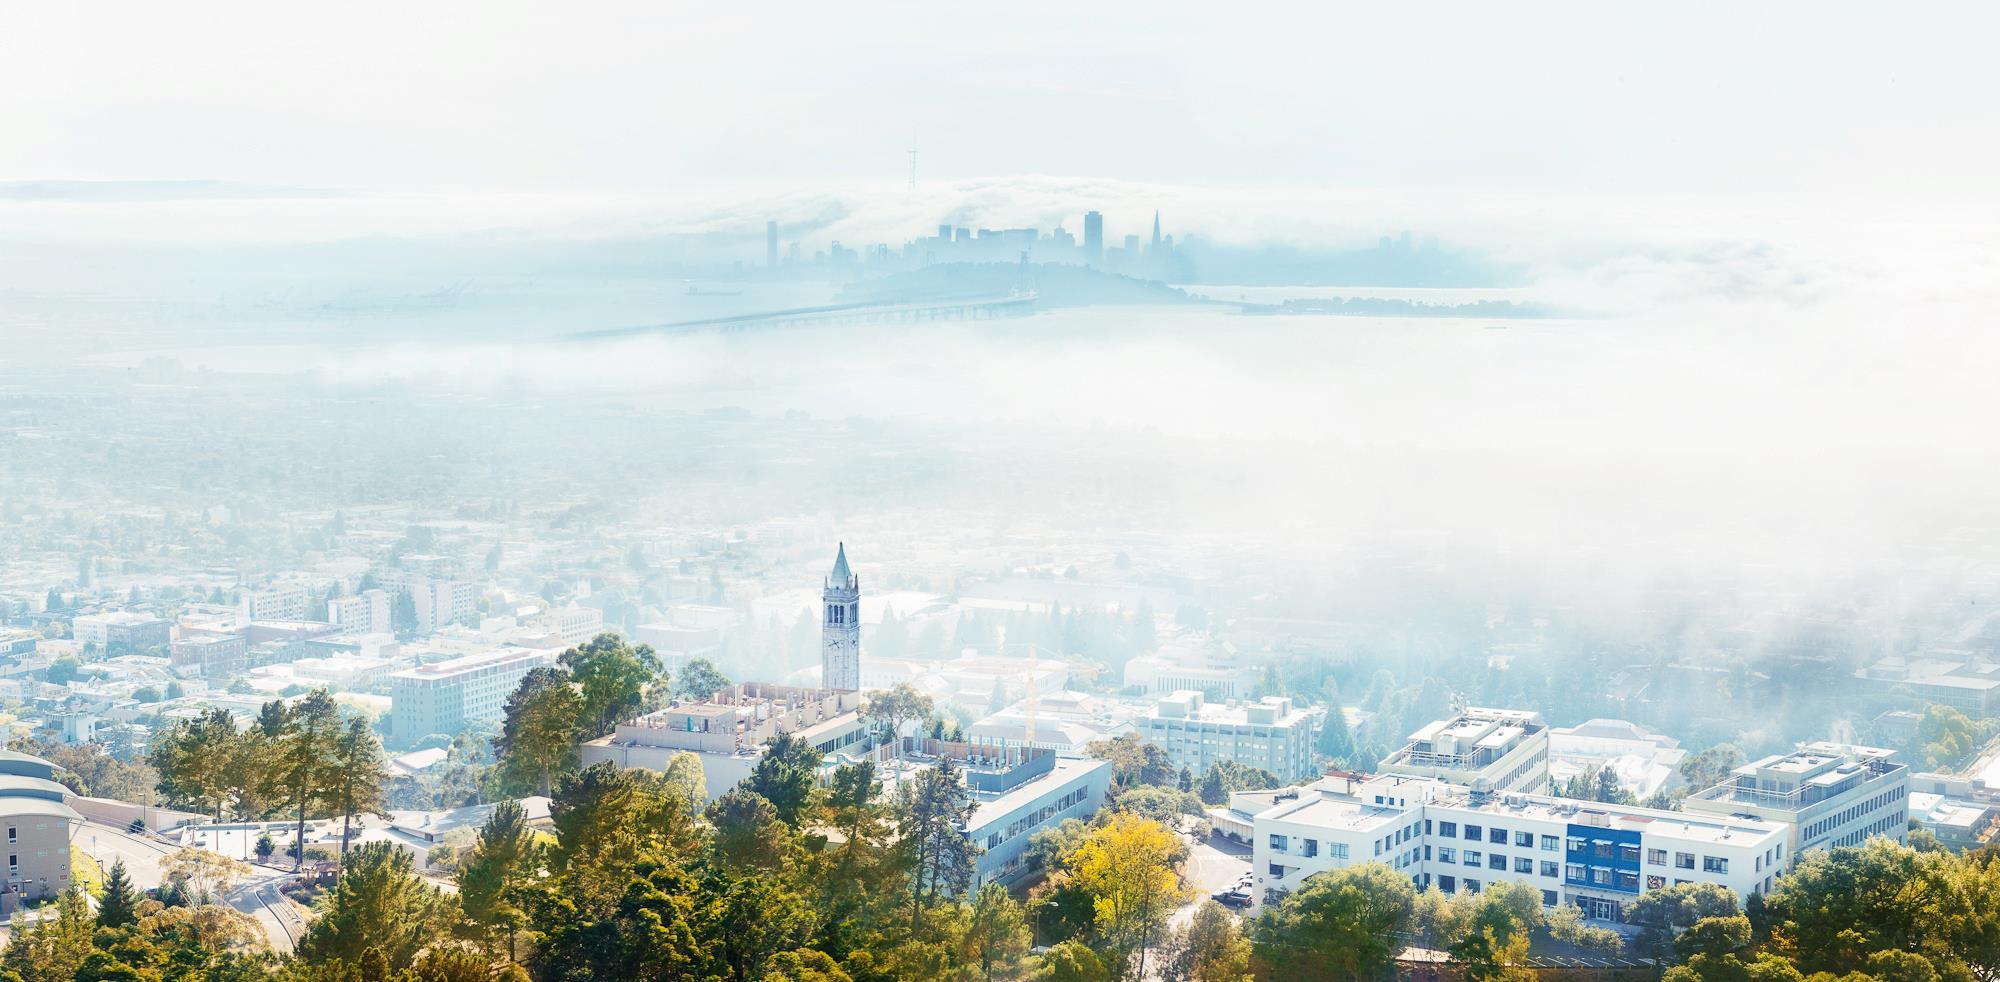 University of California Berkeley – UC Berkeley Campus